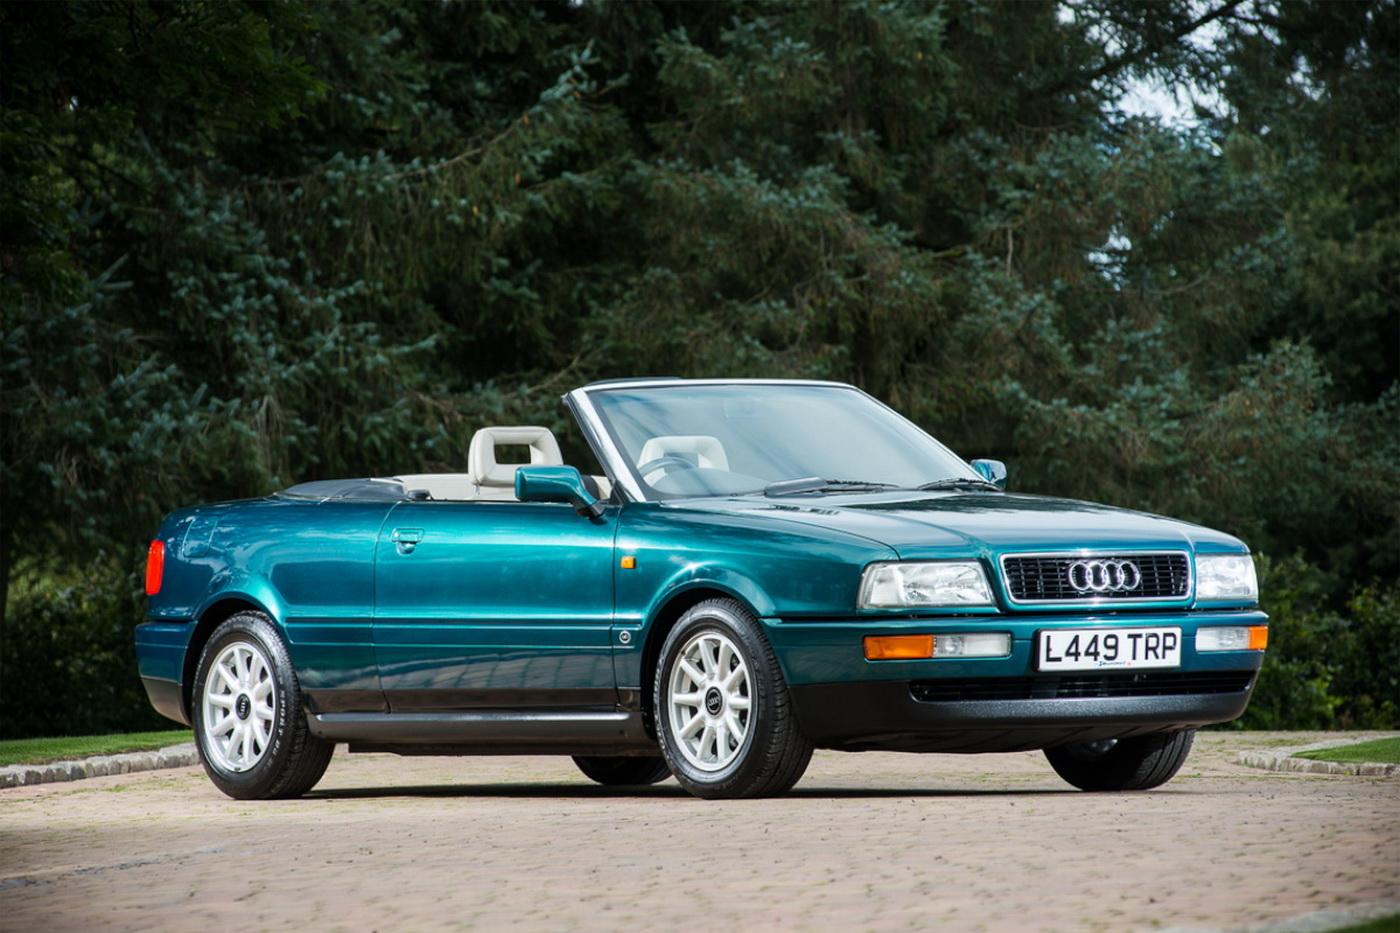 Royal Family, all'asta l'Audi 80 Cabriolet di Lady Diana